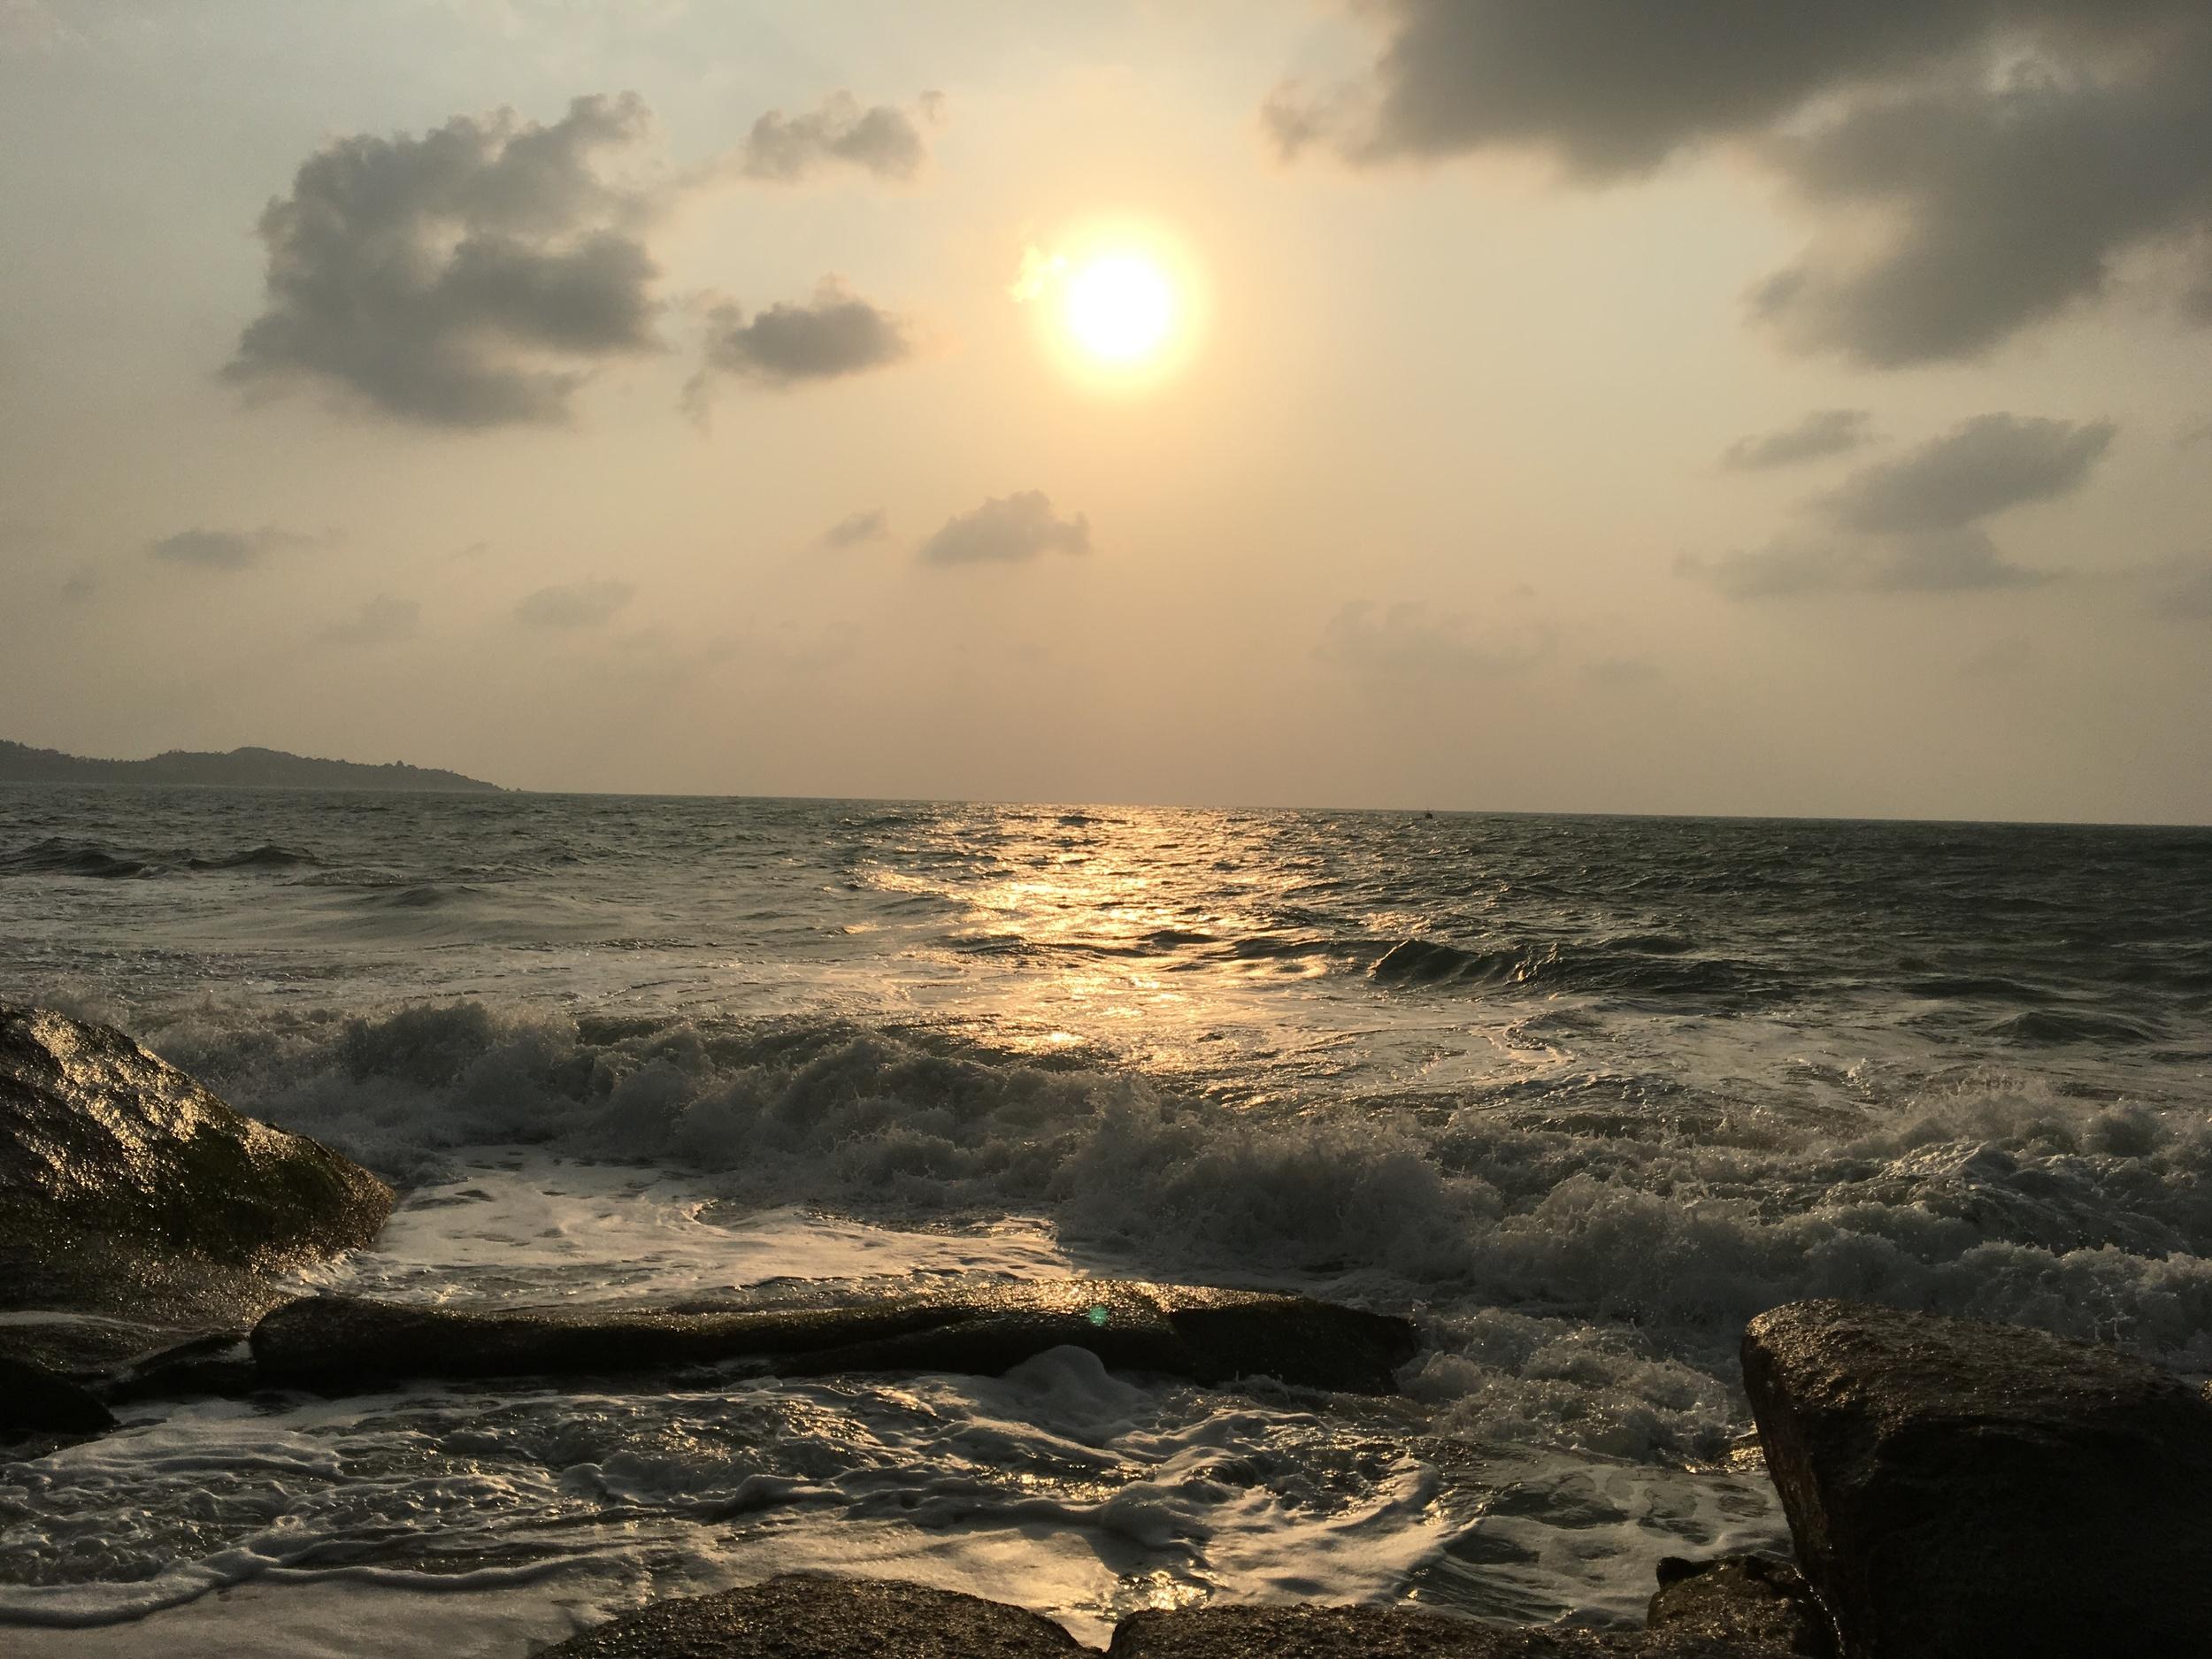 A Sunrise in Thailand